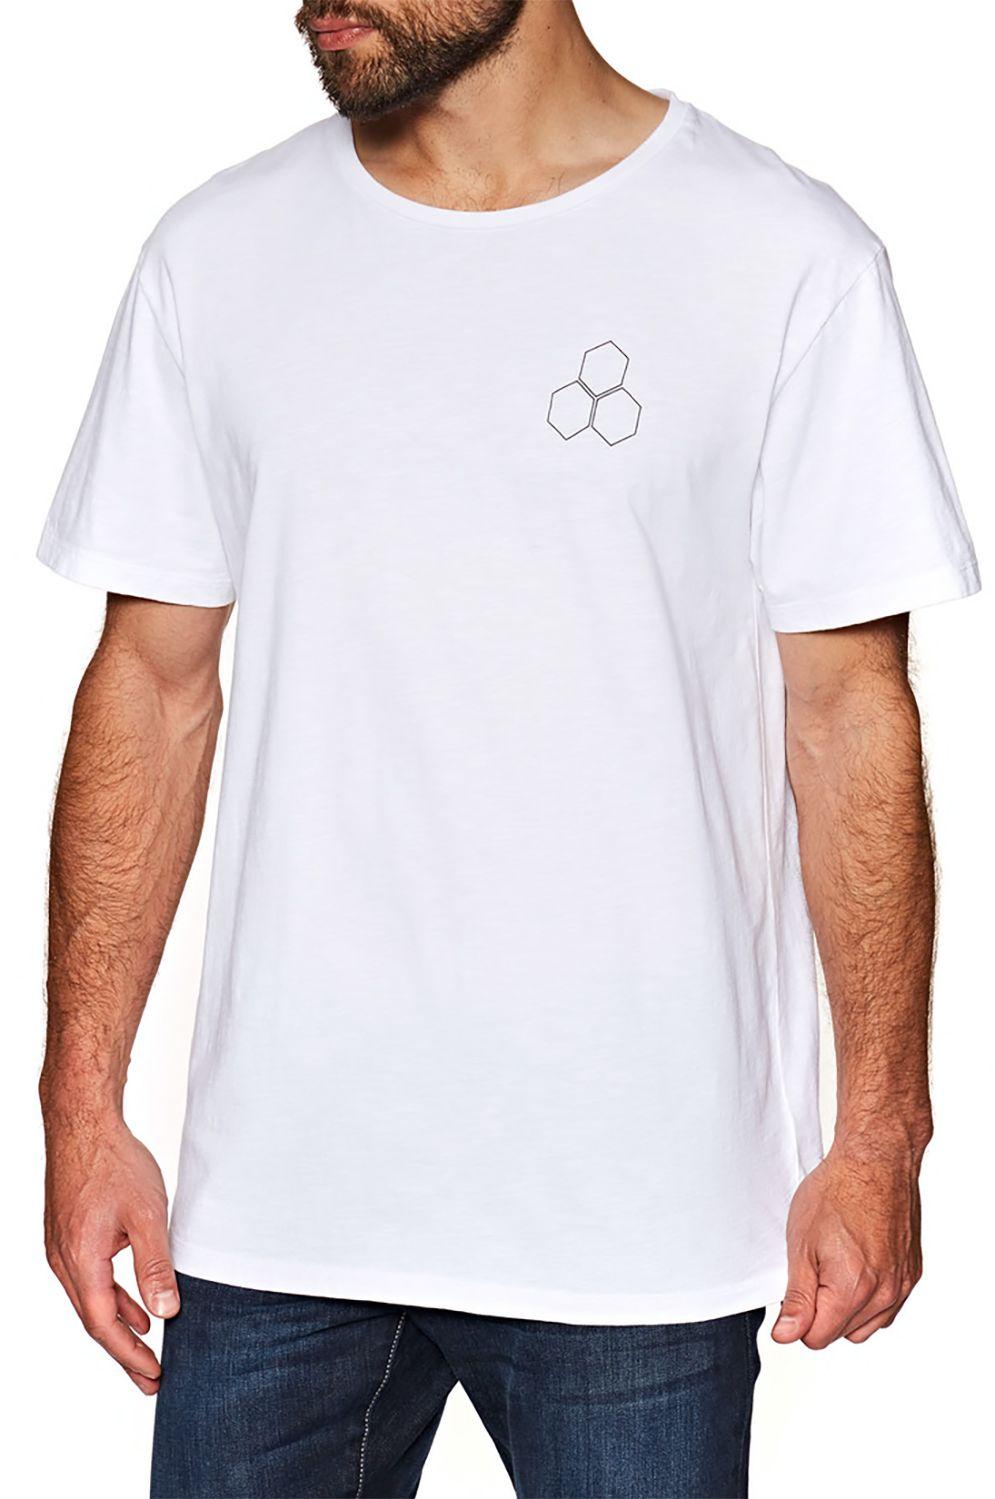 Al Merrick T-Shirt SHAPES DESIGN White